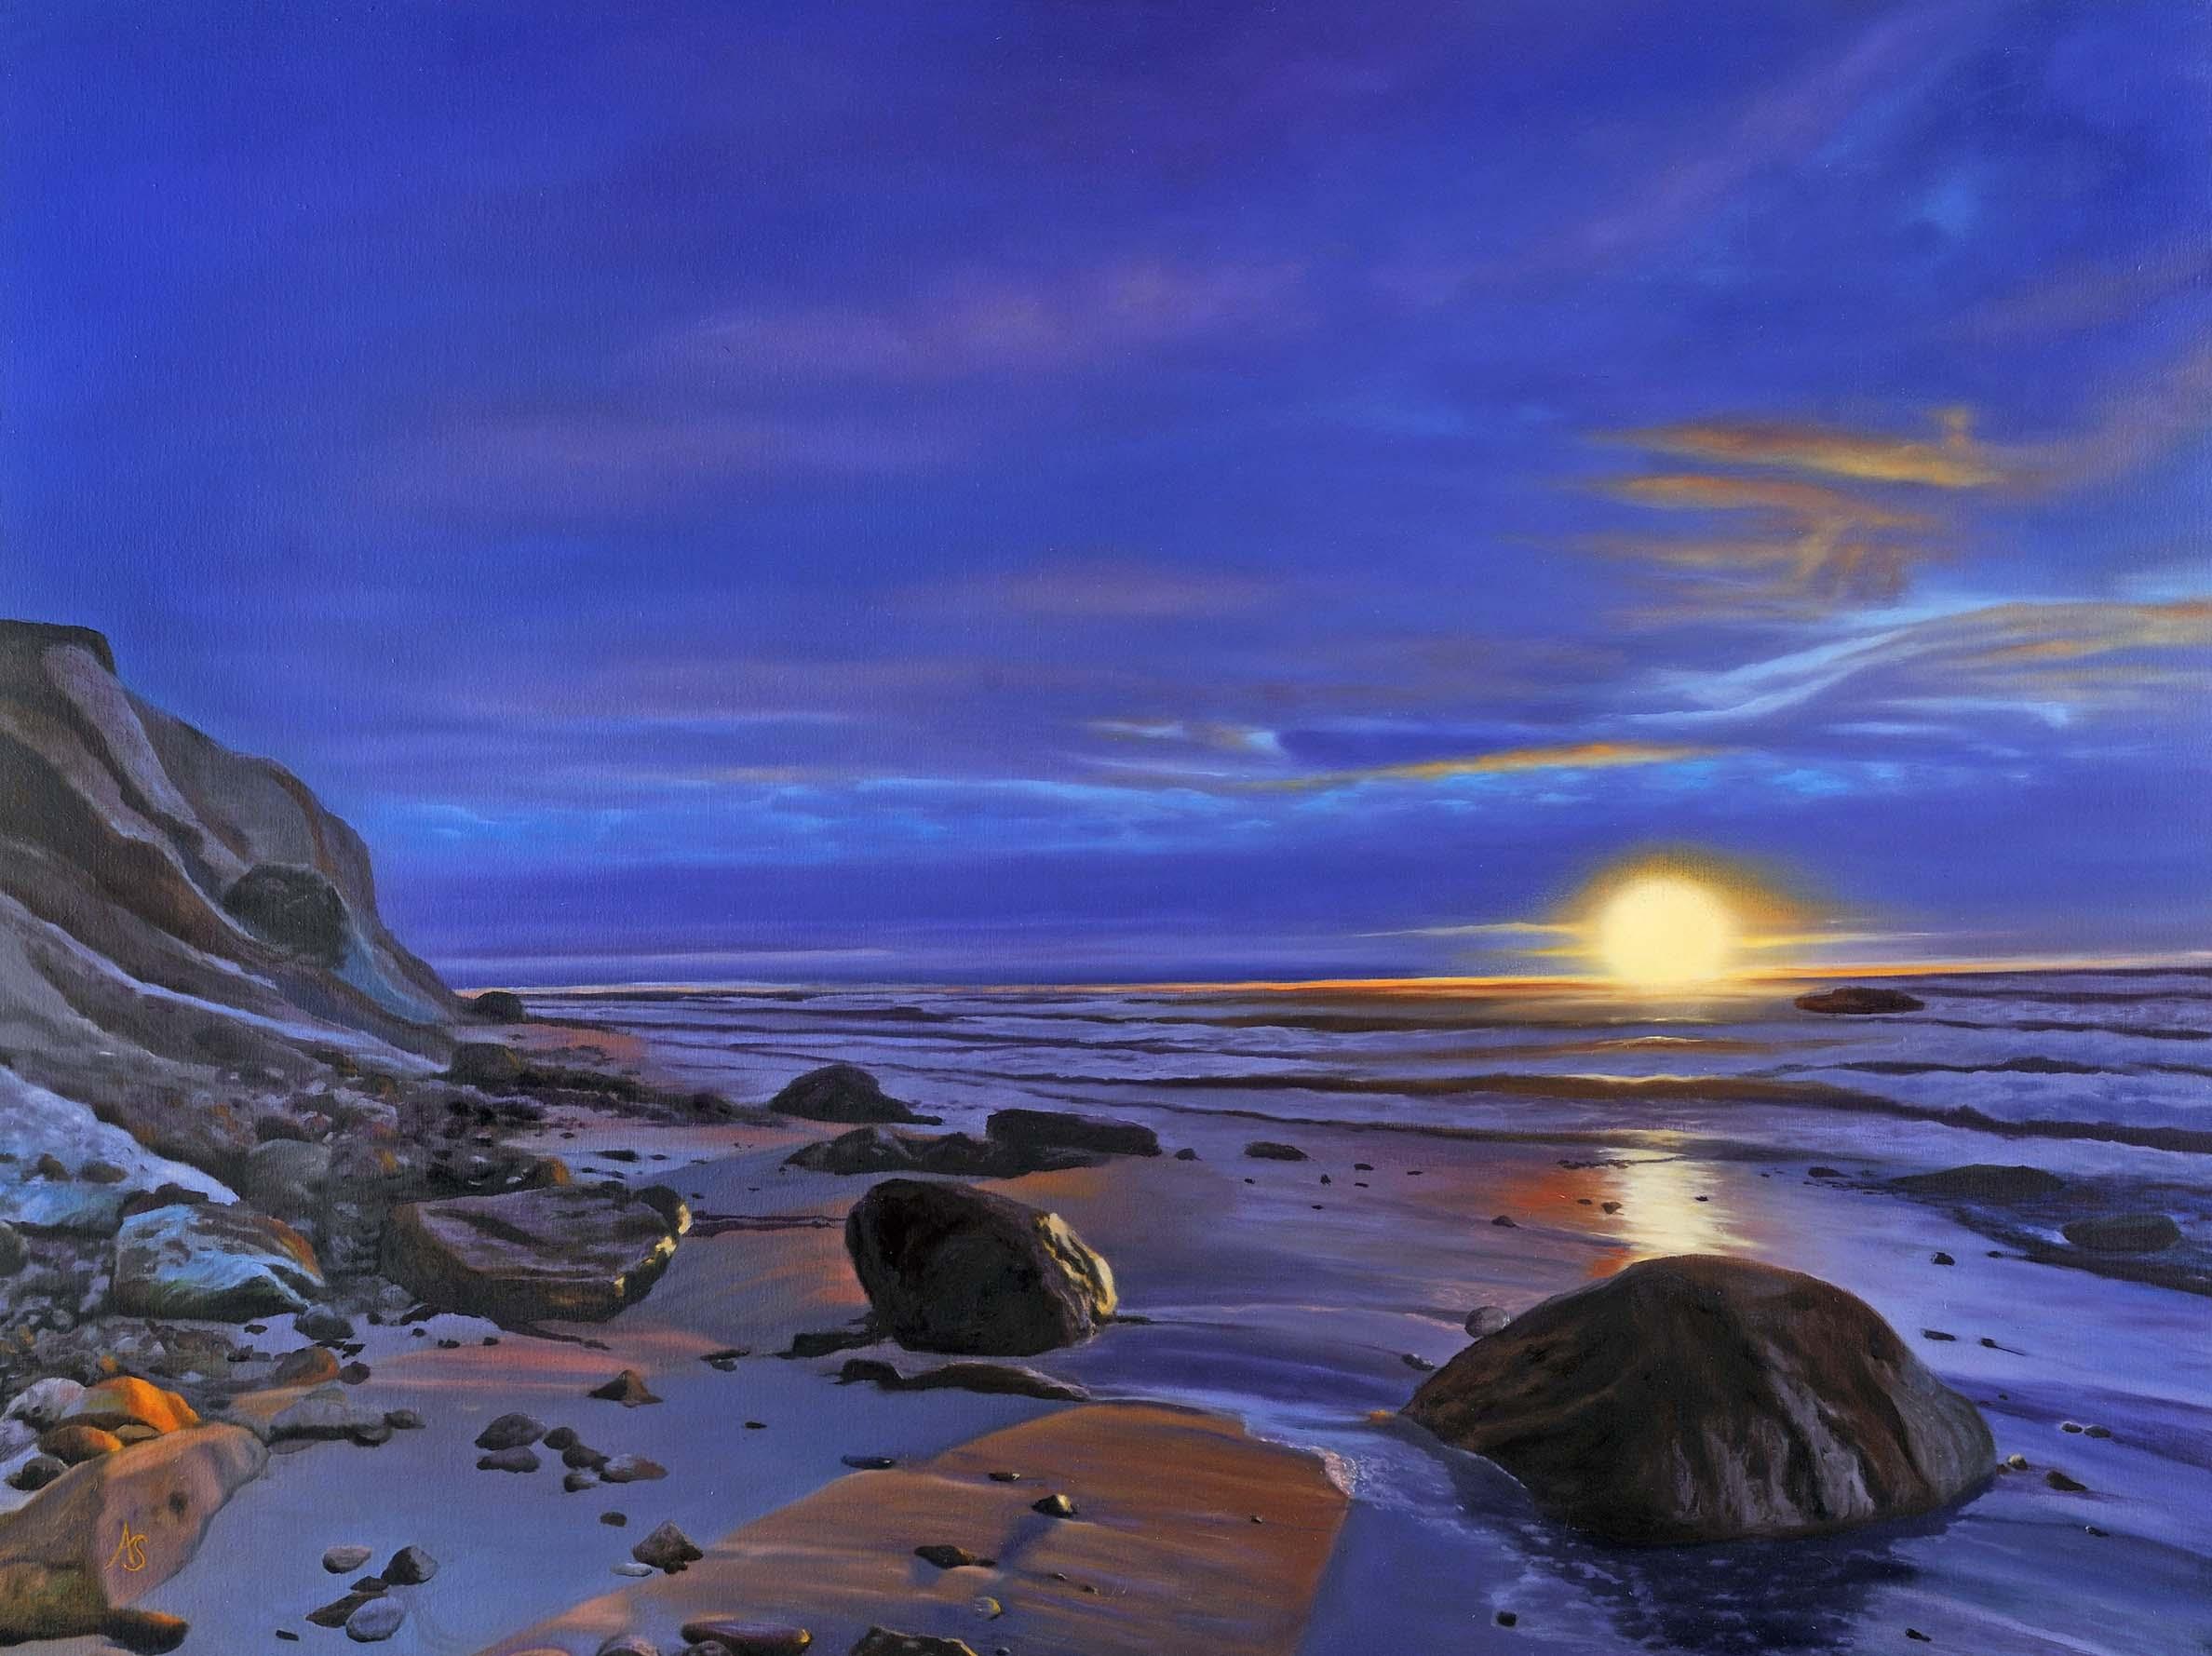 Ocean Sunset (Martha's Vineyard)